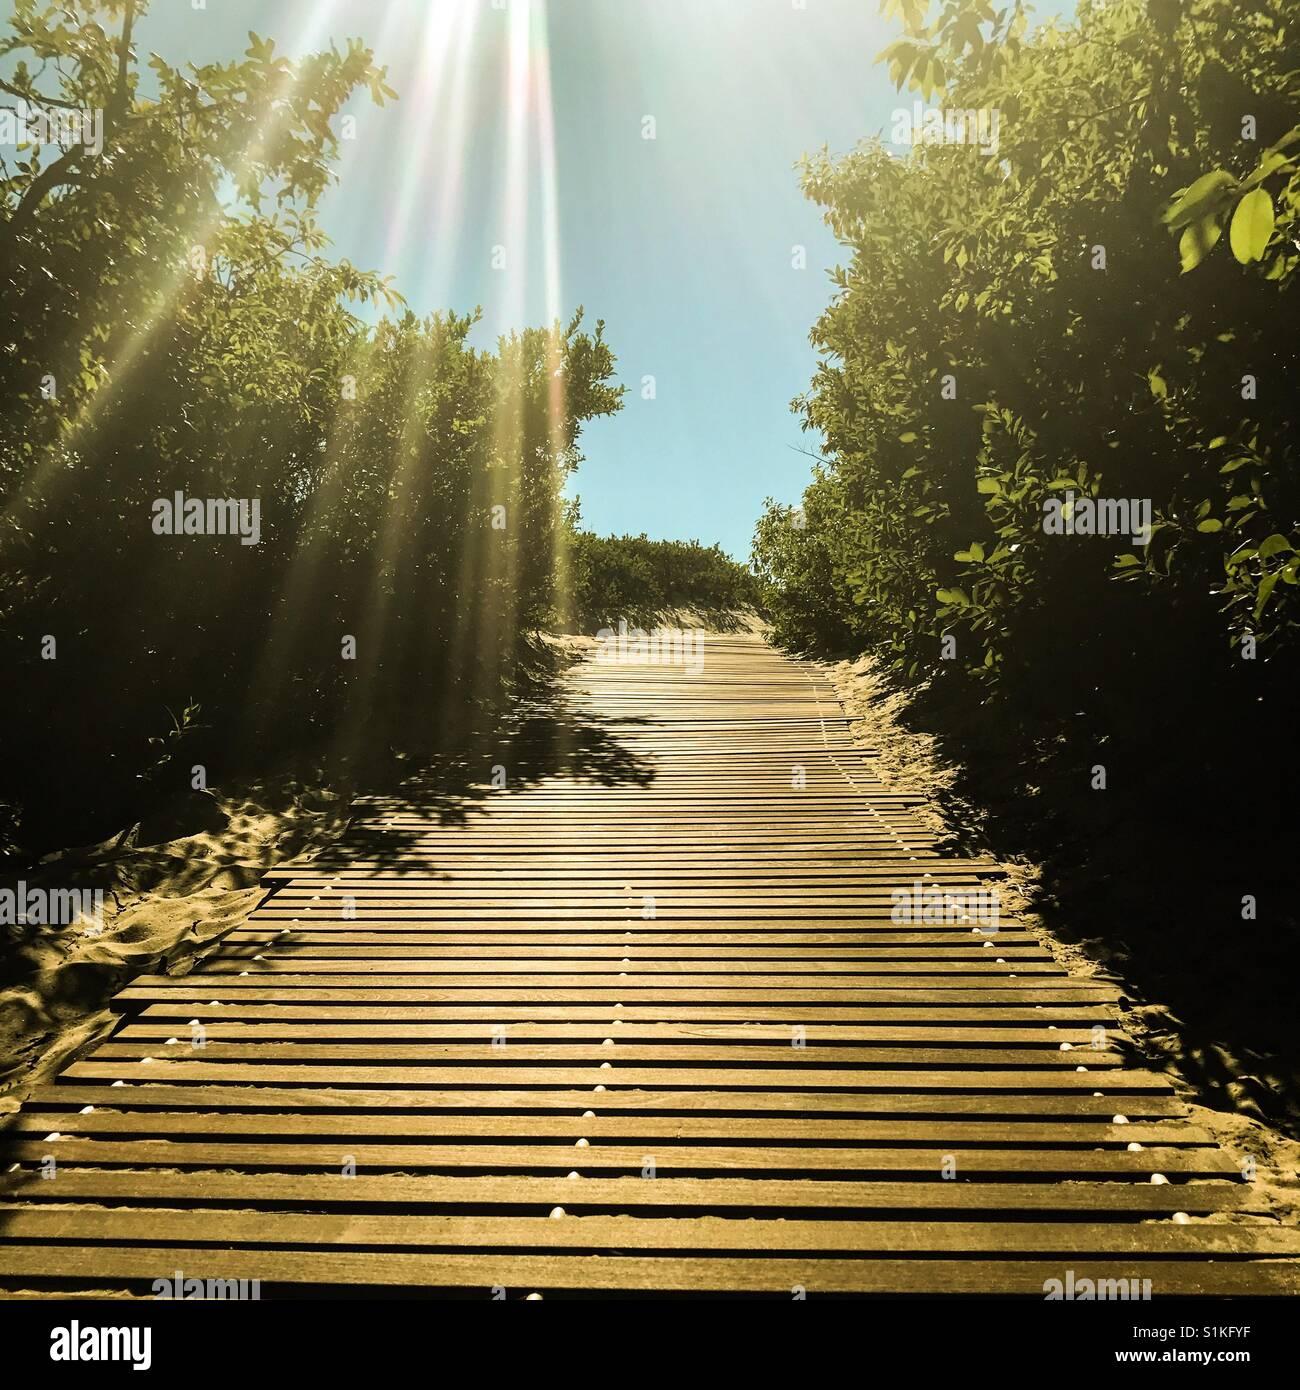 Sunshine on nature path - Stock Image